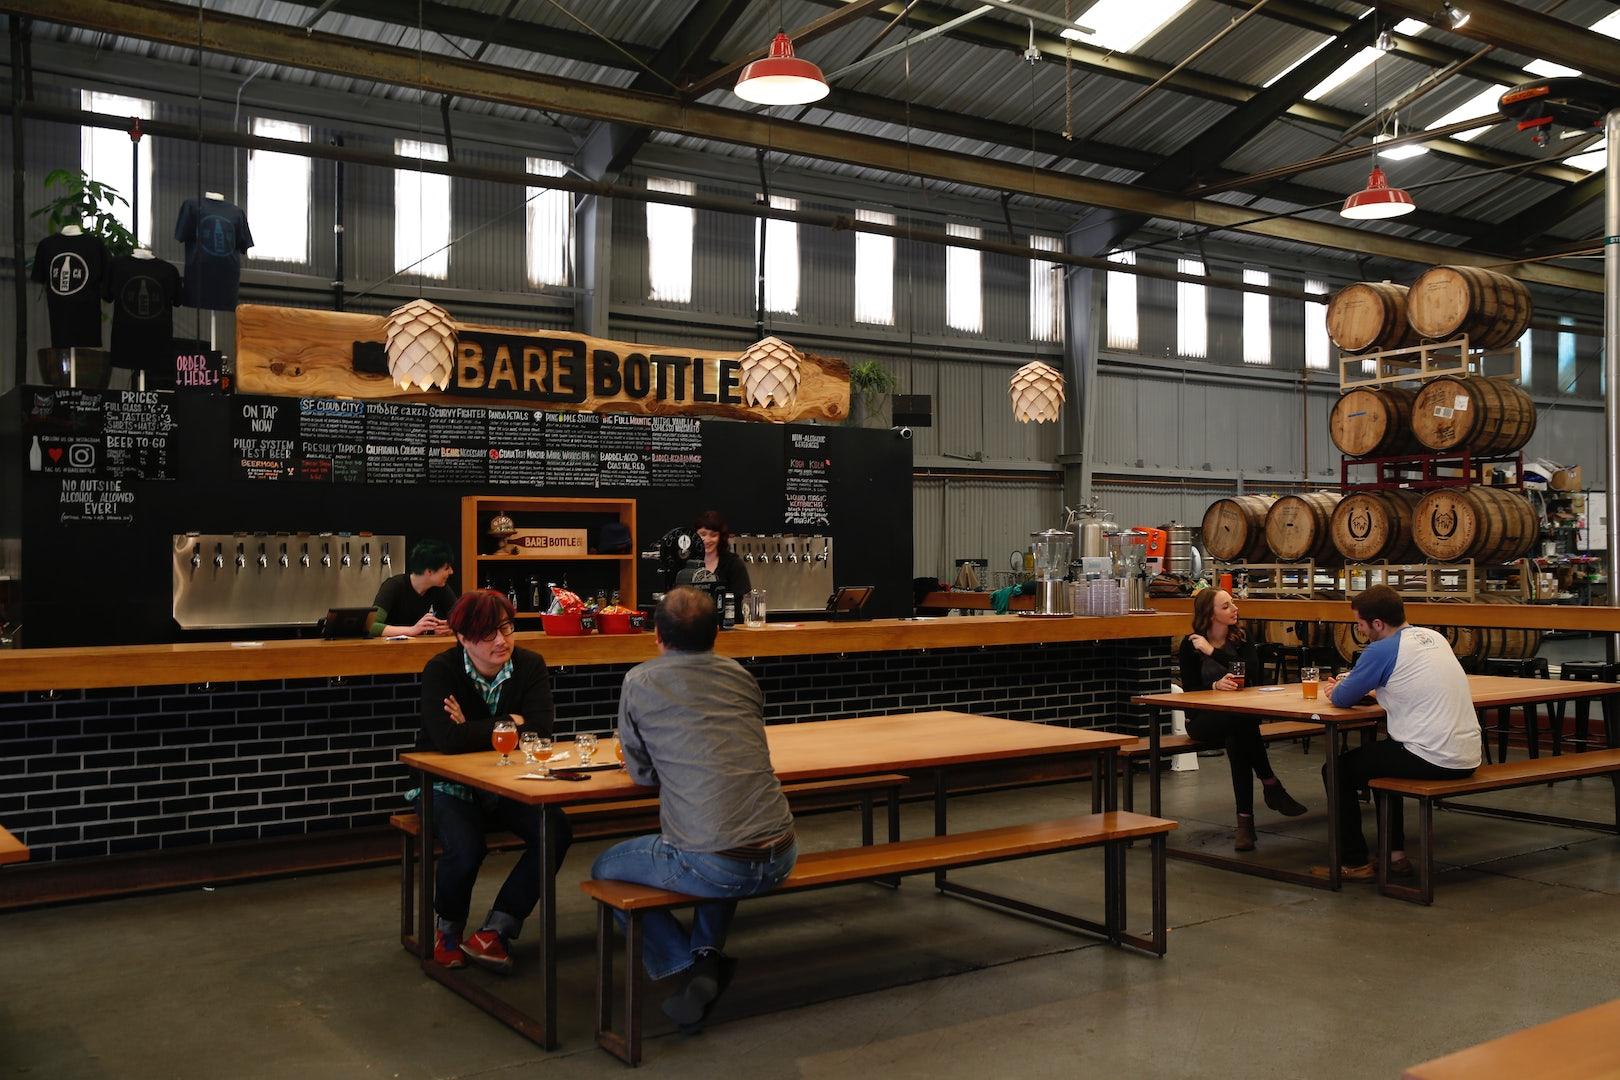 San Francisco - Barebottle Brewing